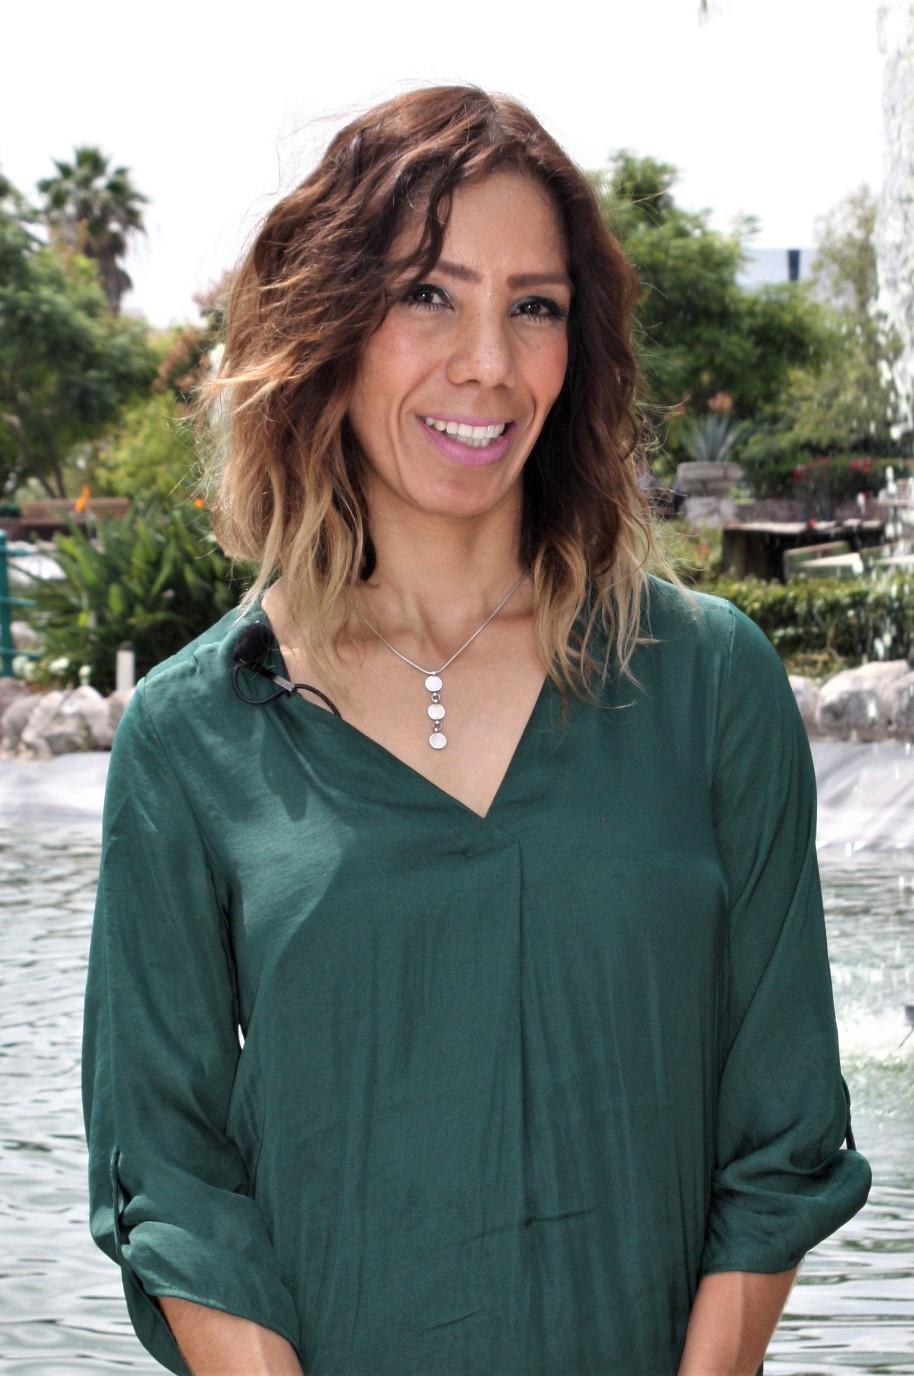 Natalie Rosales Pérez